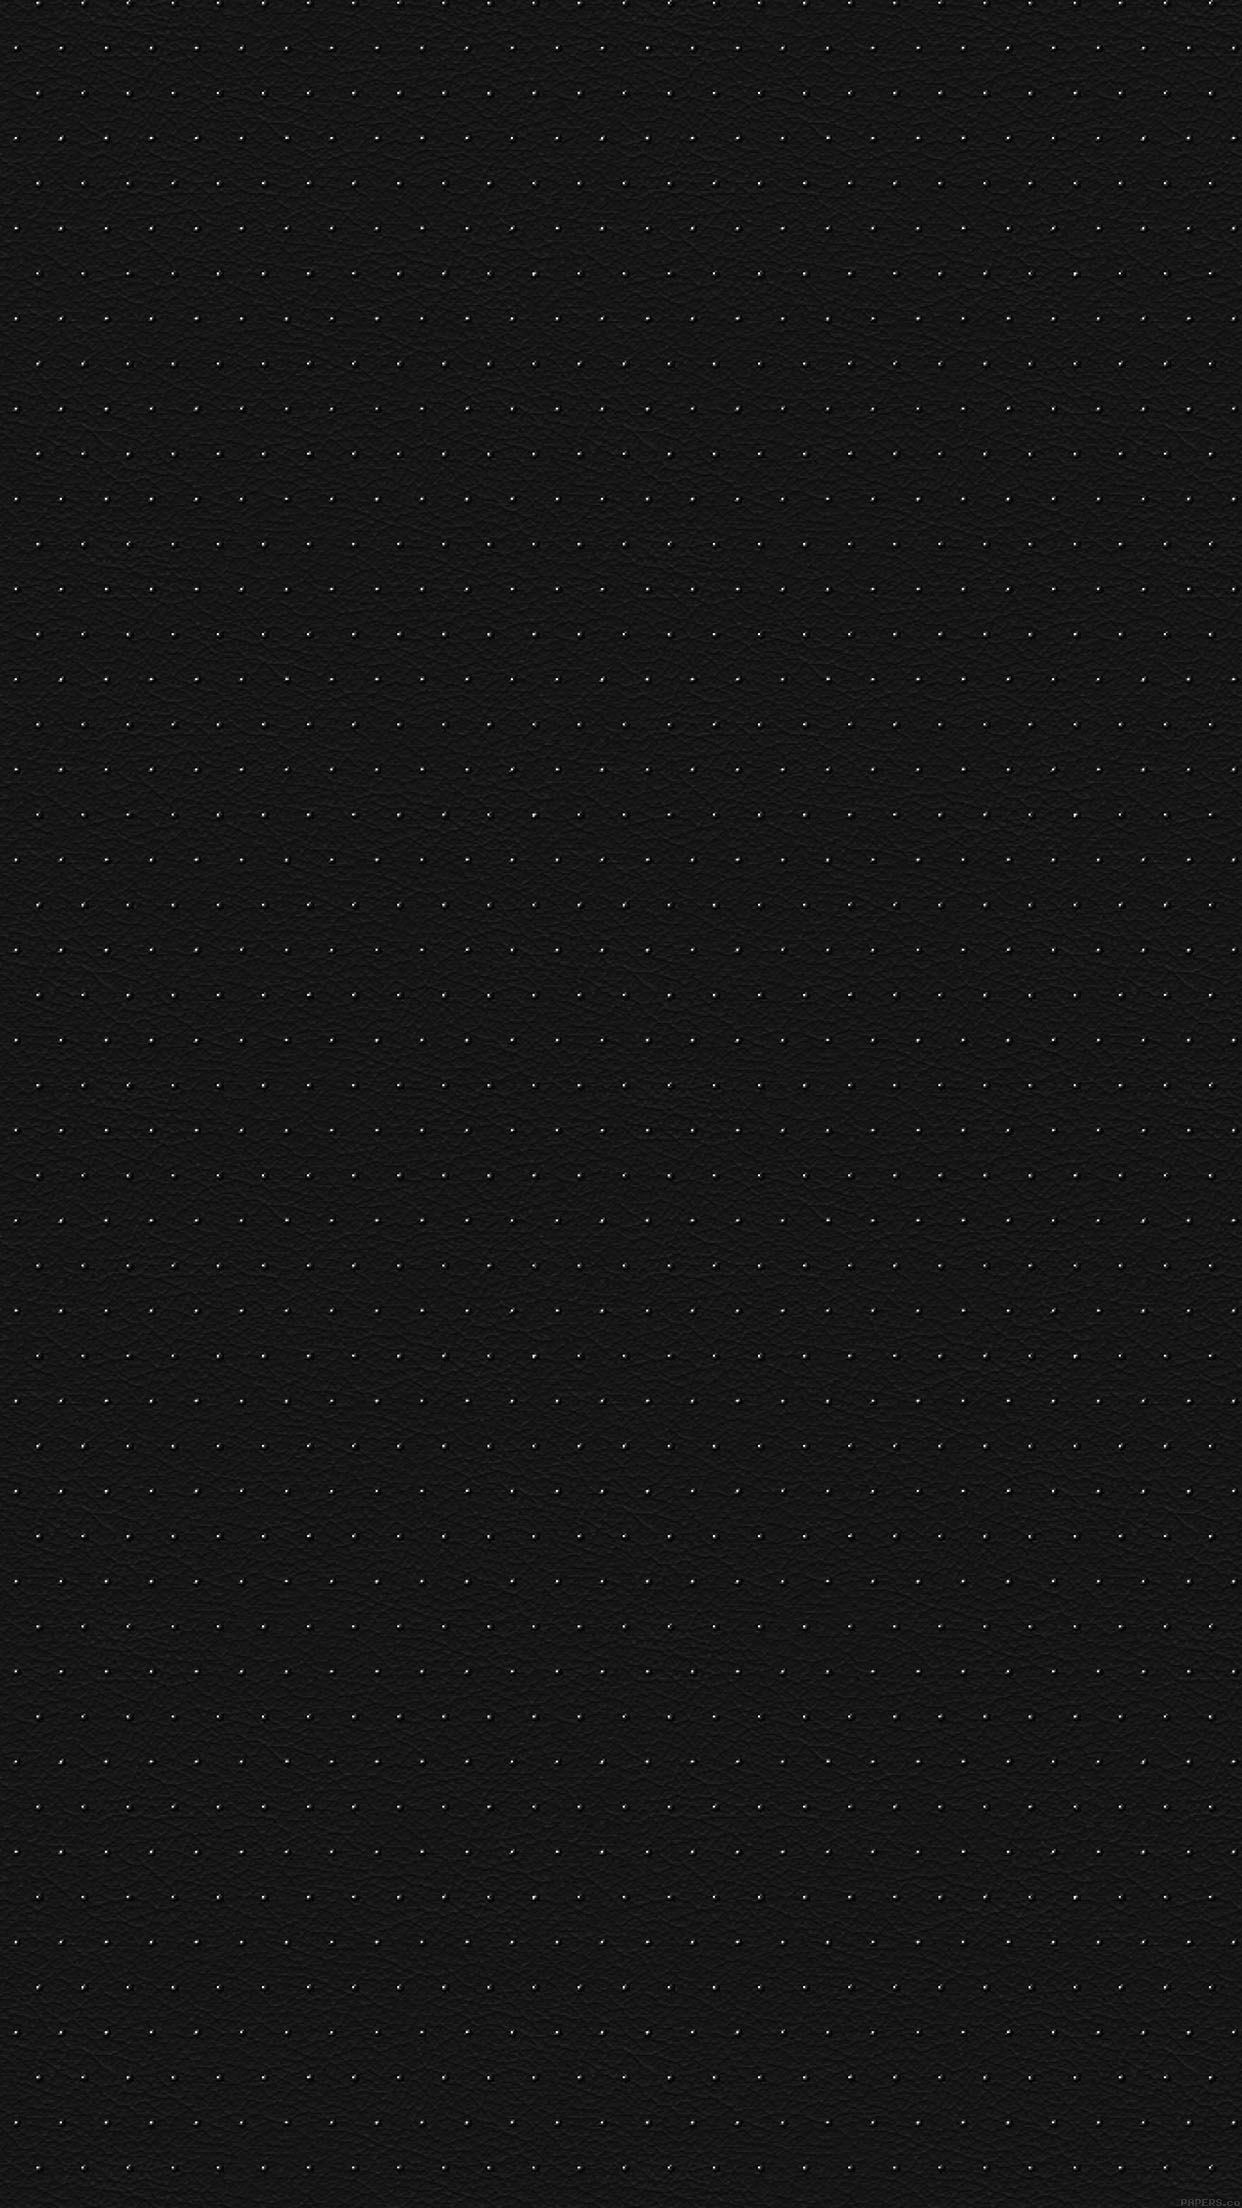 dark-wallpaper-applifevn-5